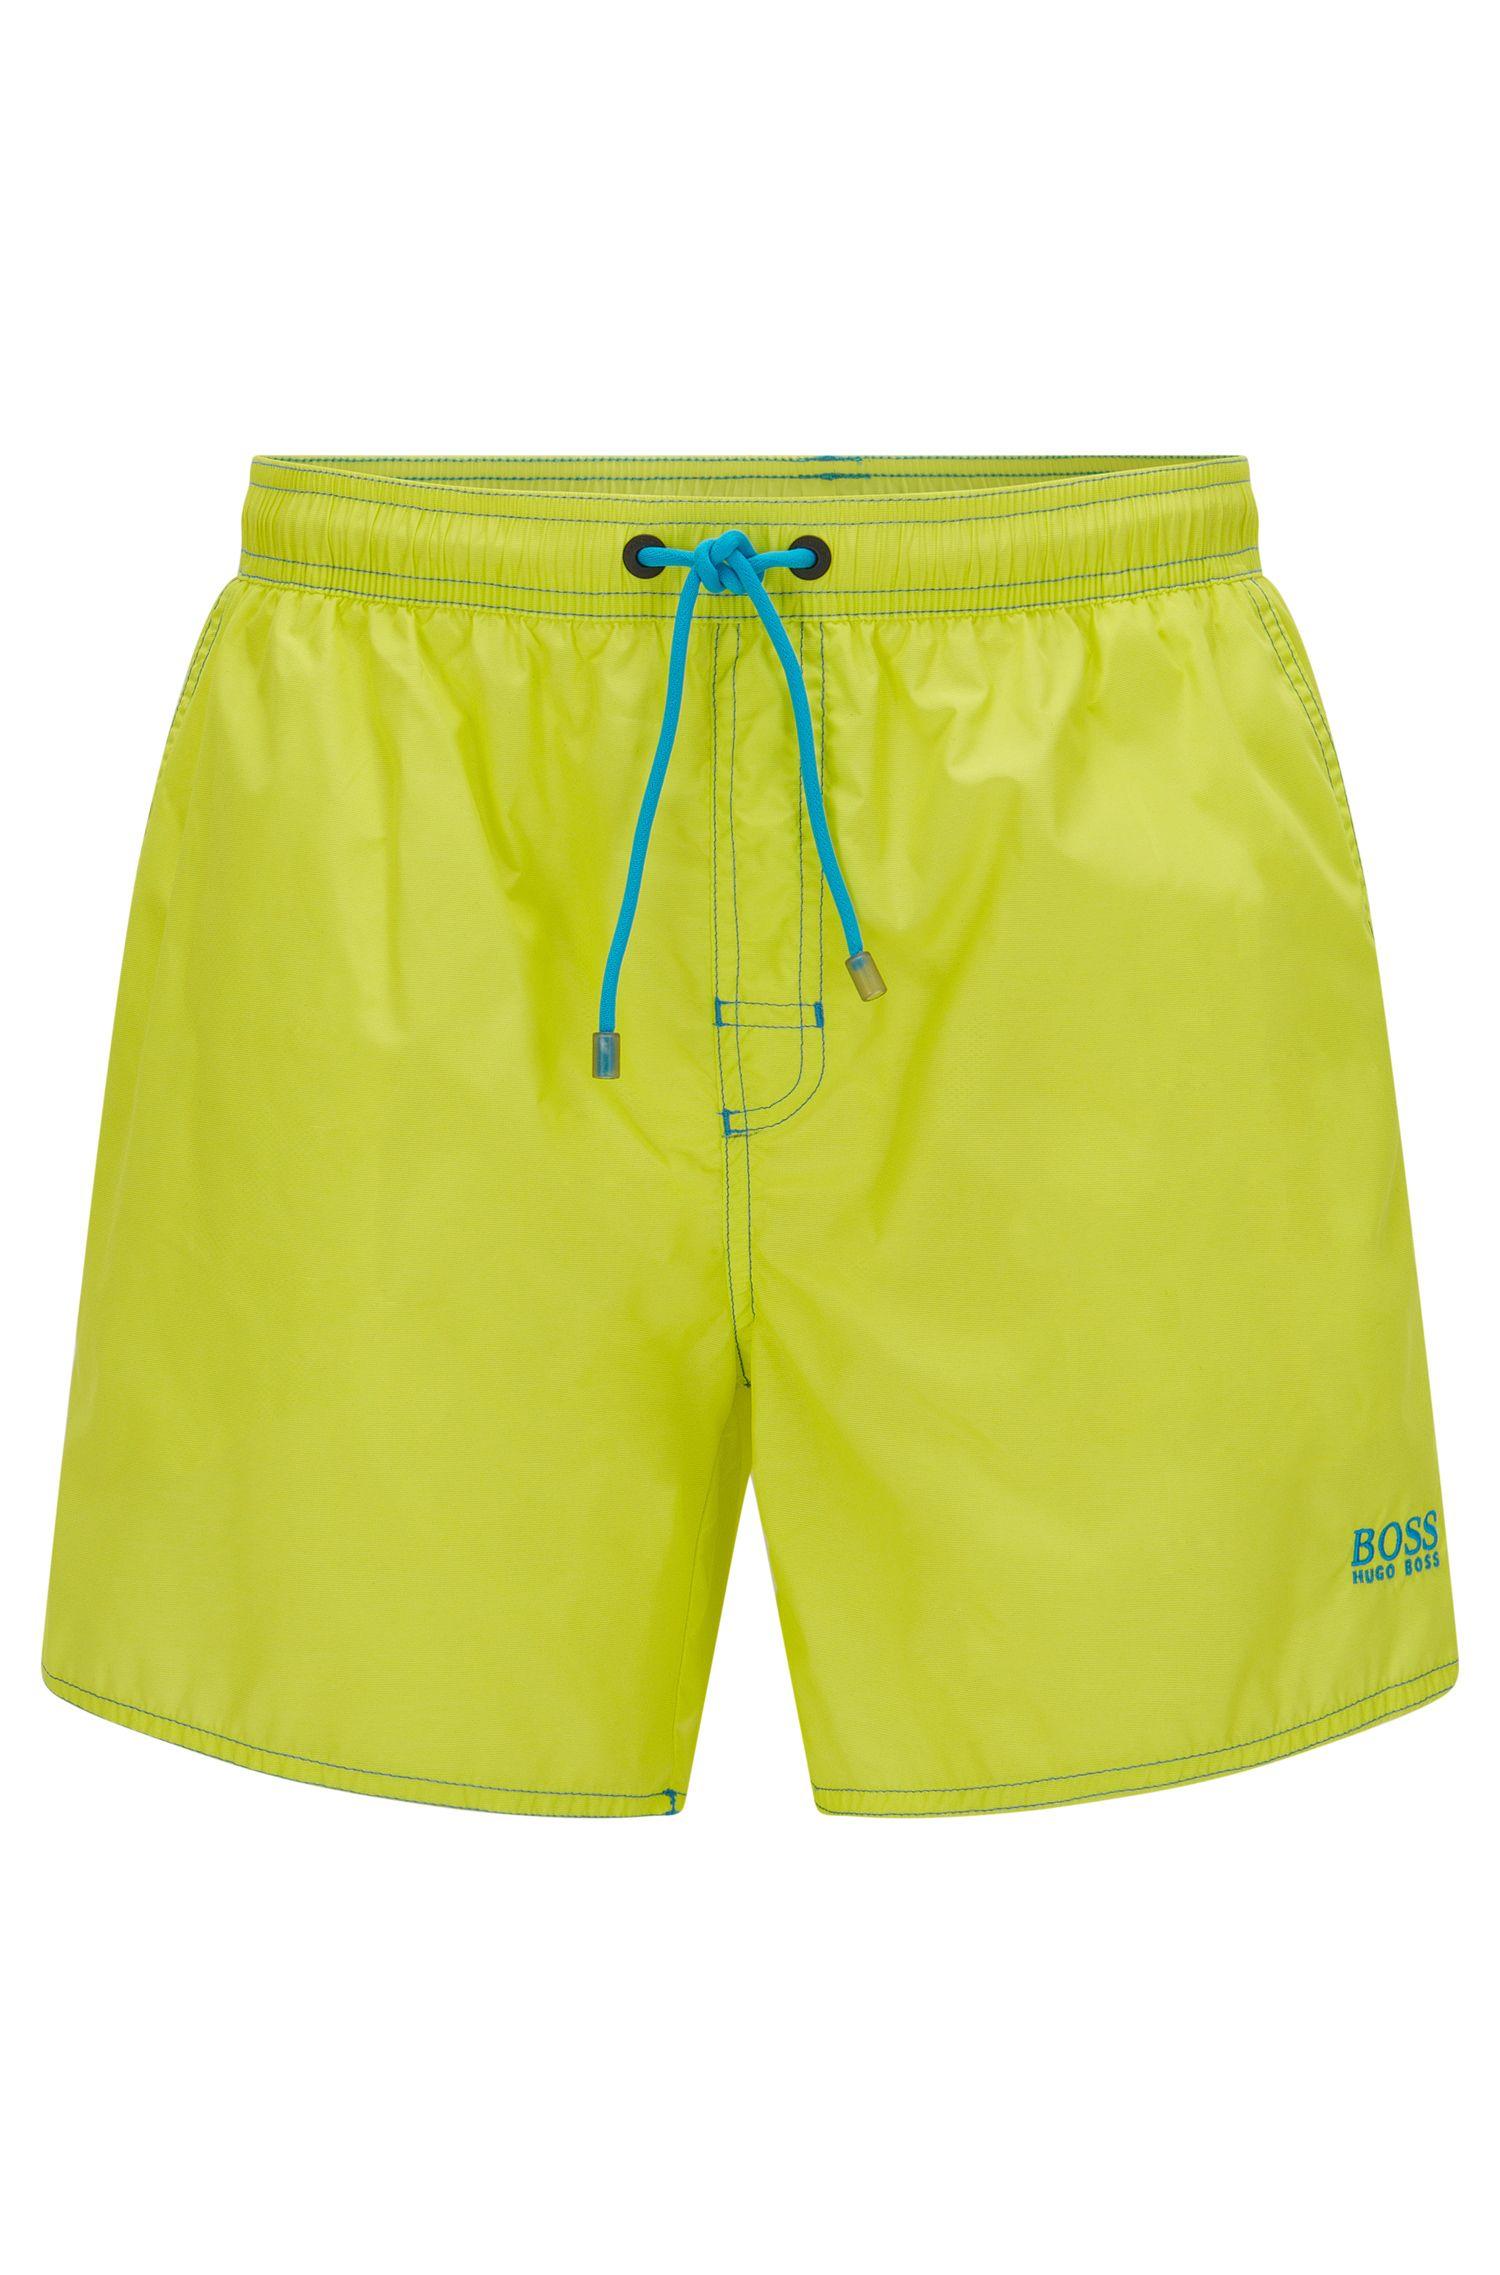 Short-length swim shorts in technical fabric